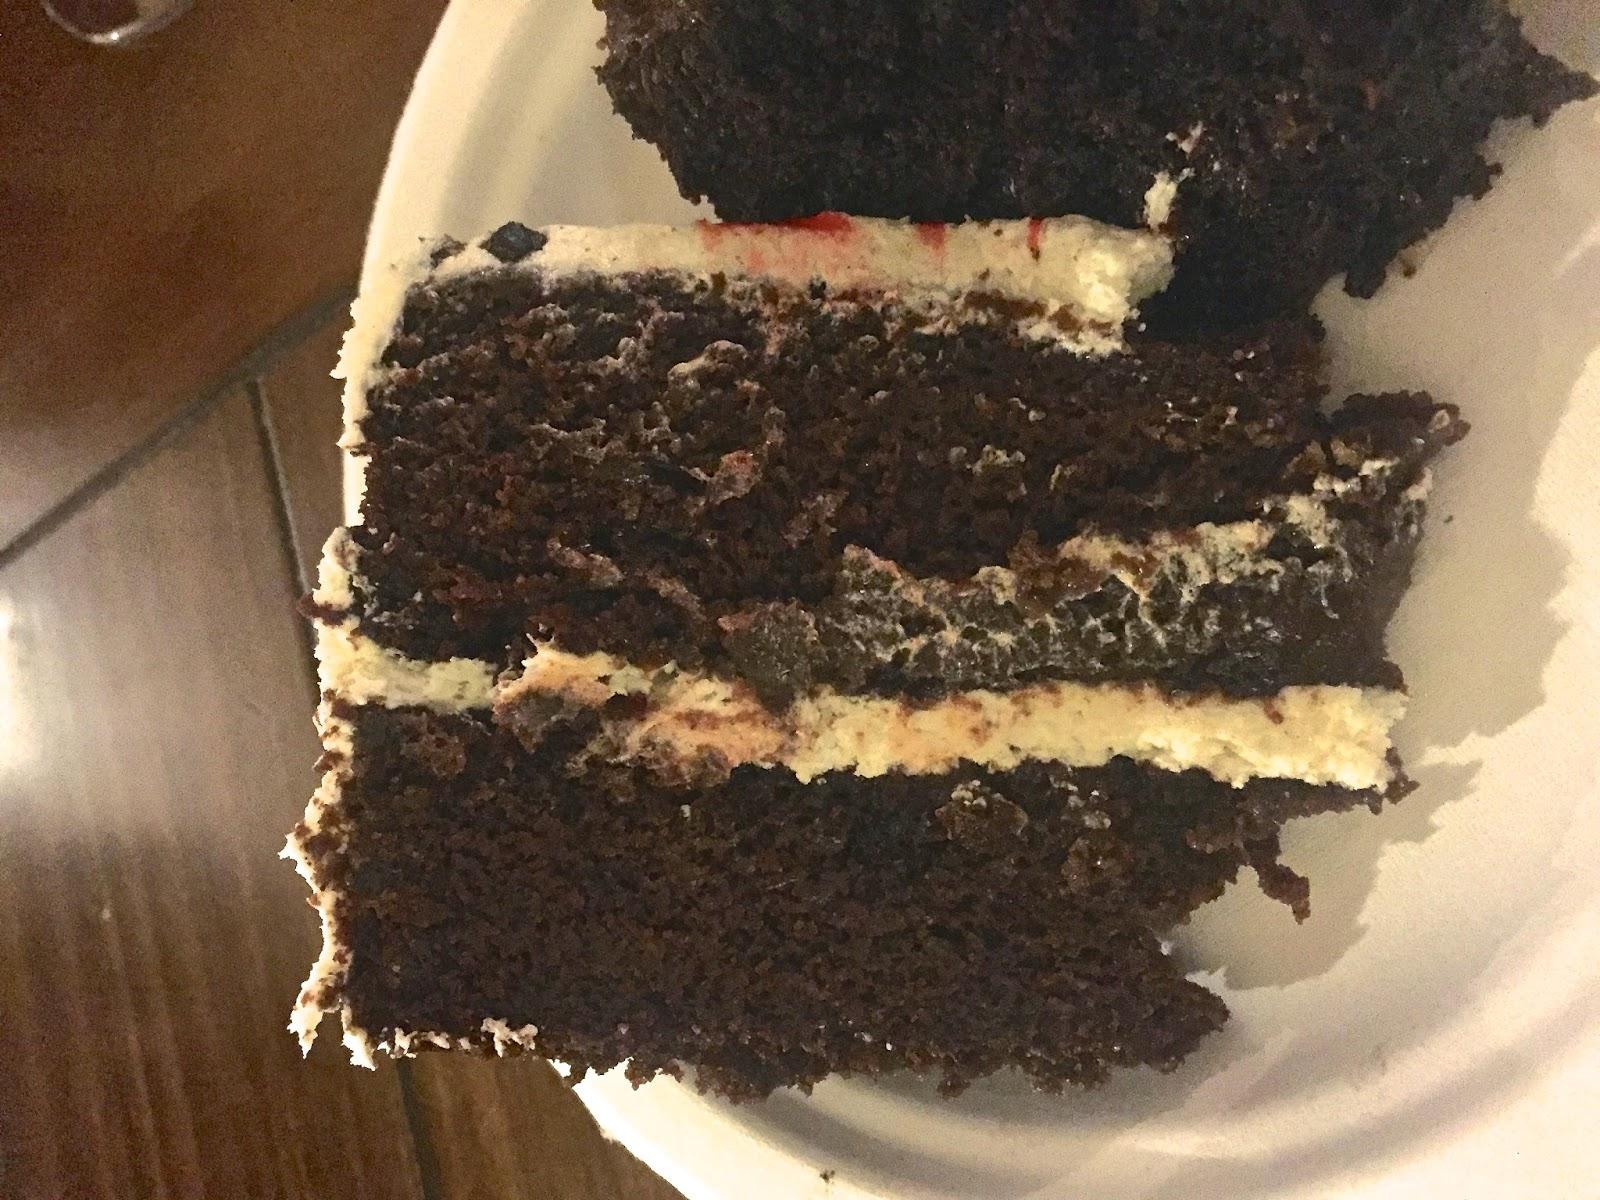 Slice of Gluten-Free Vegan Chocolate Cake Veega Blog Chloe